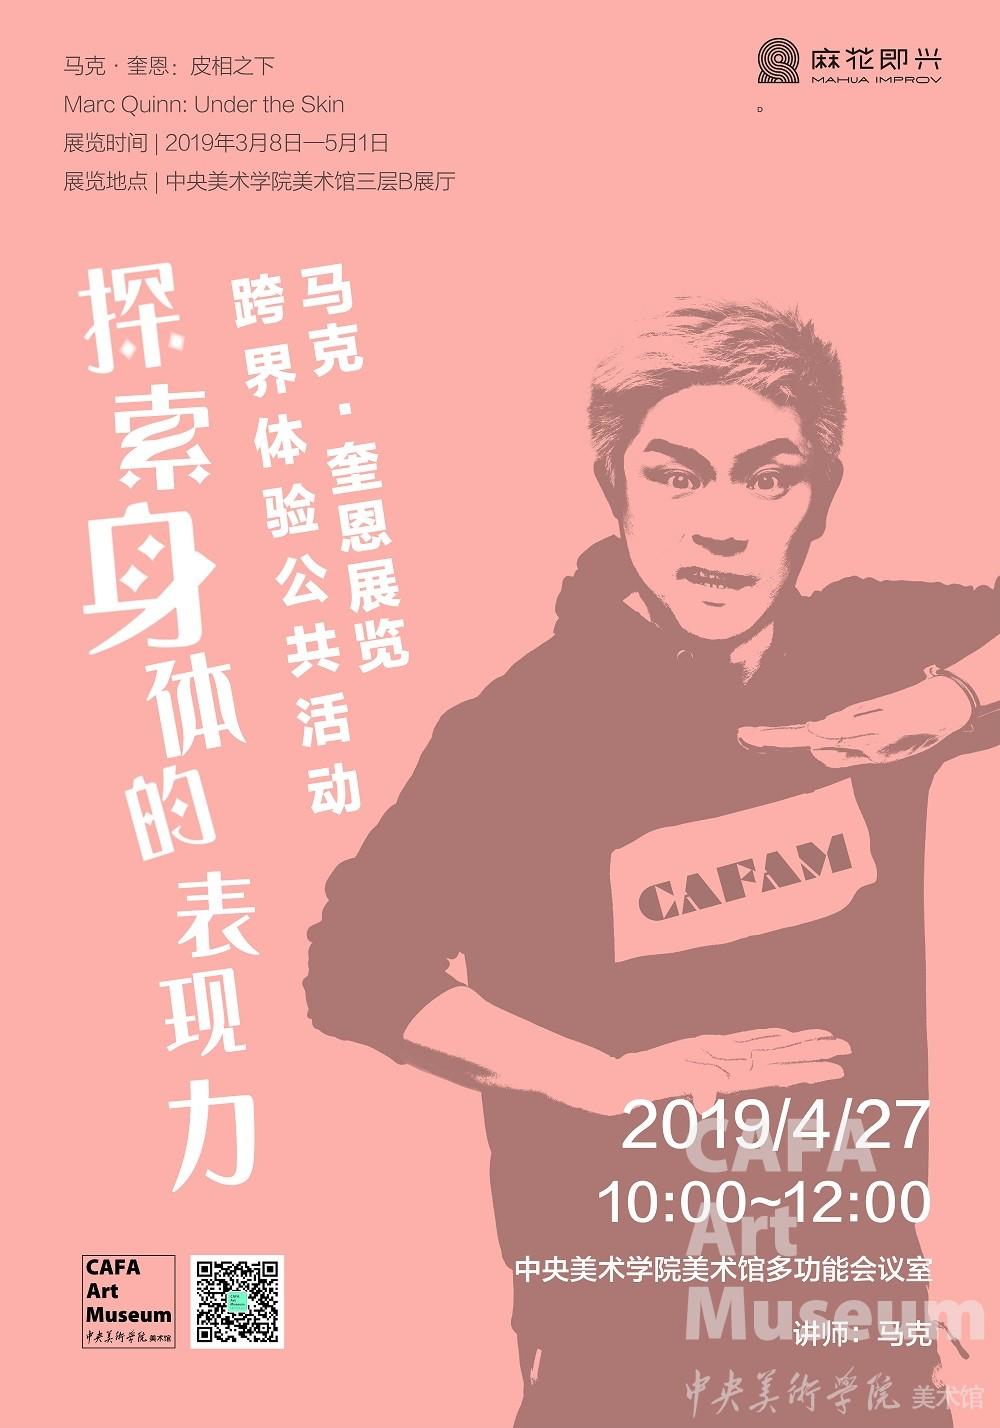 http://static.cafamuseum.org/museum-image/image/201904/sy_1556248508252315.jpg